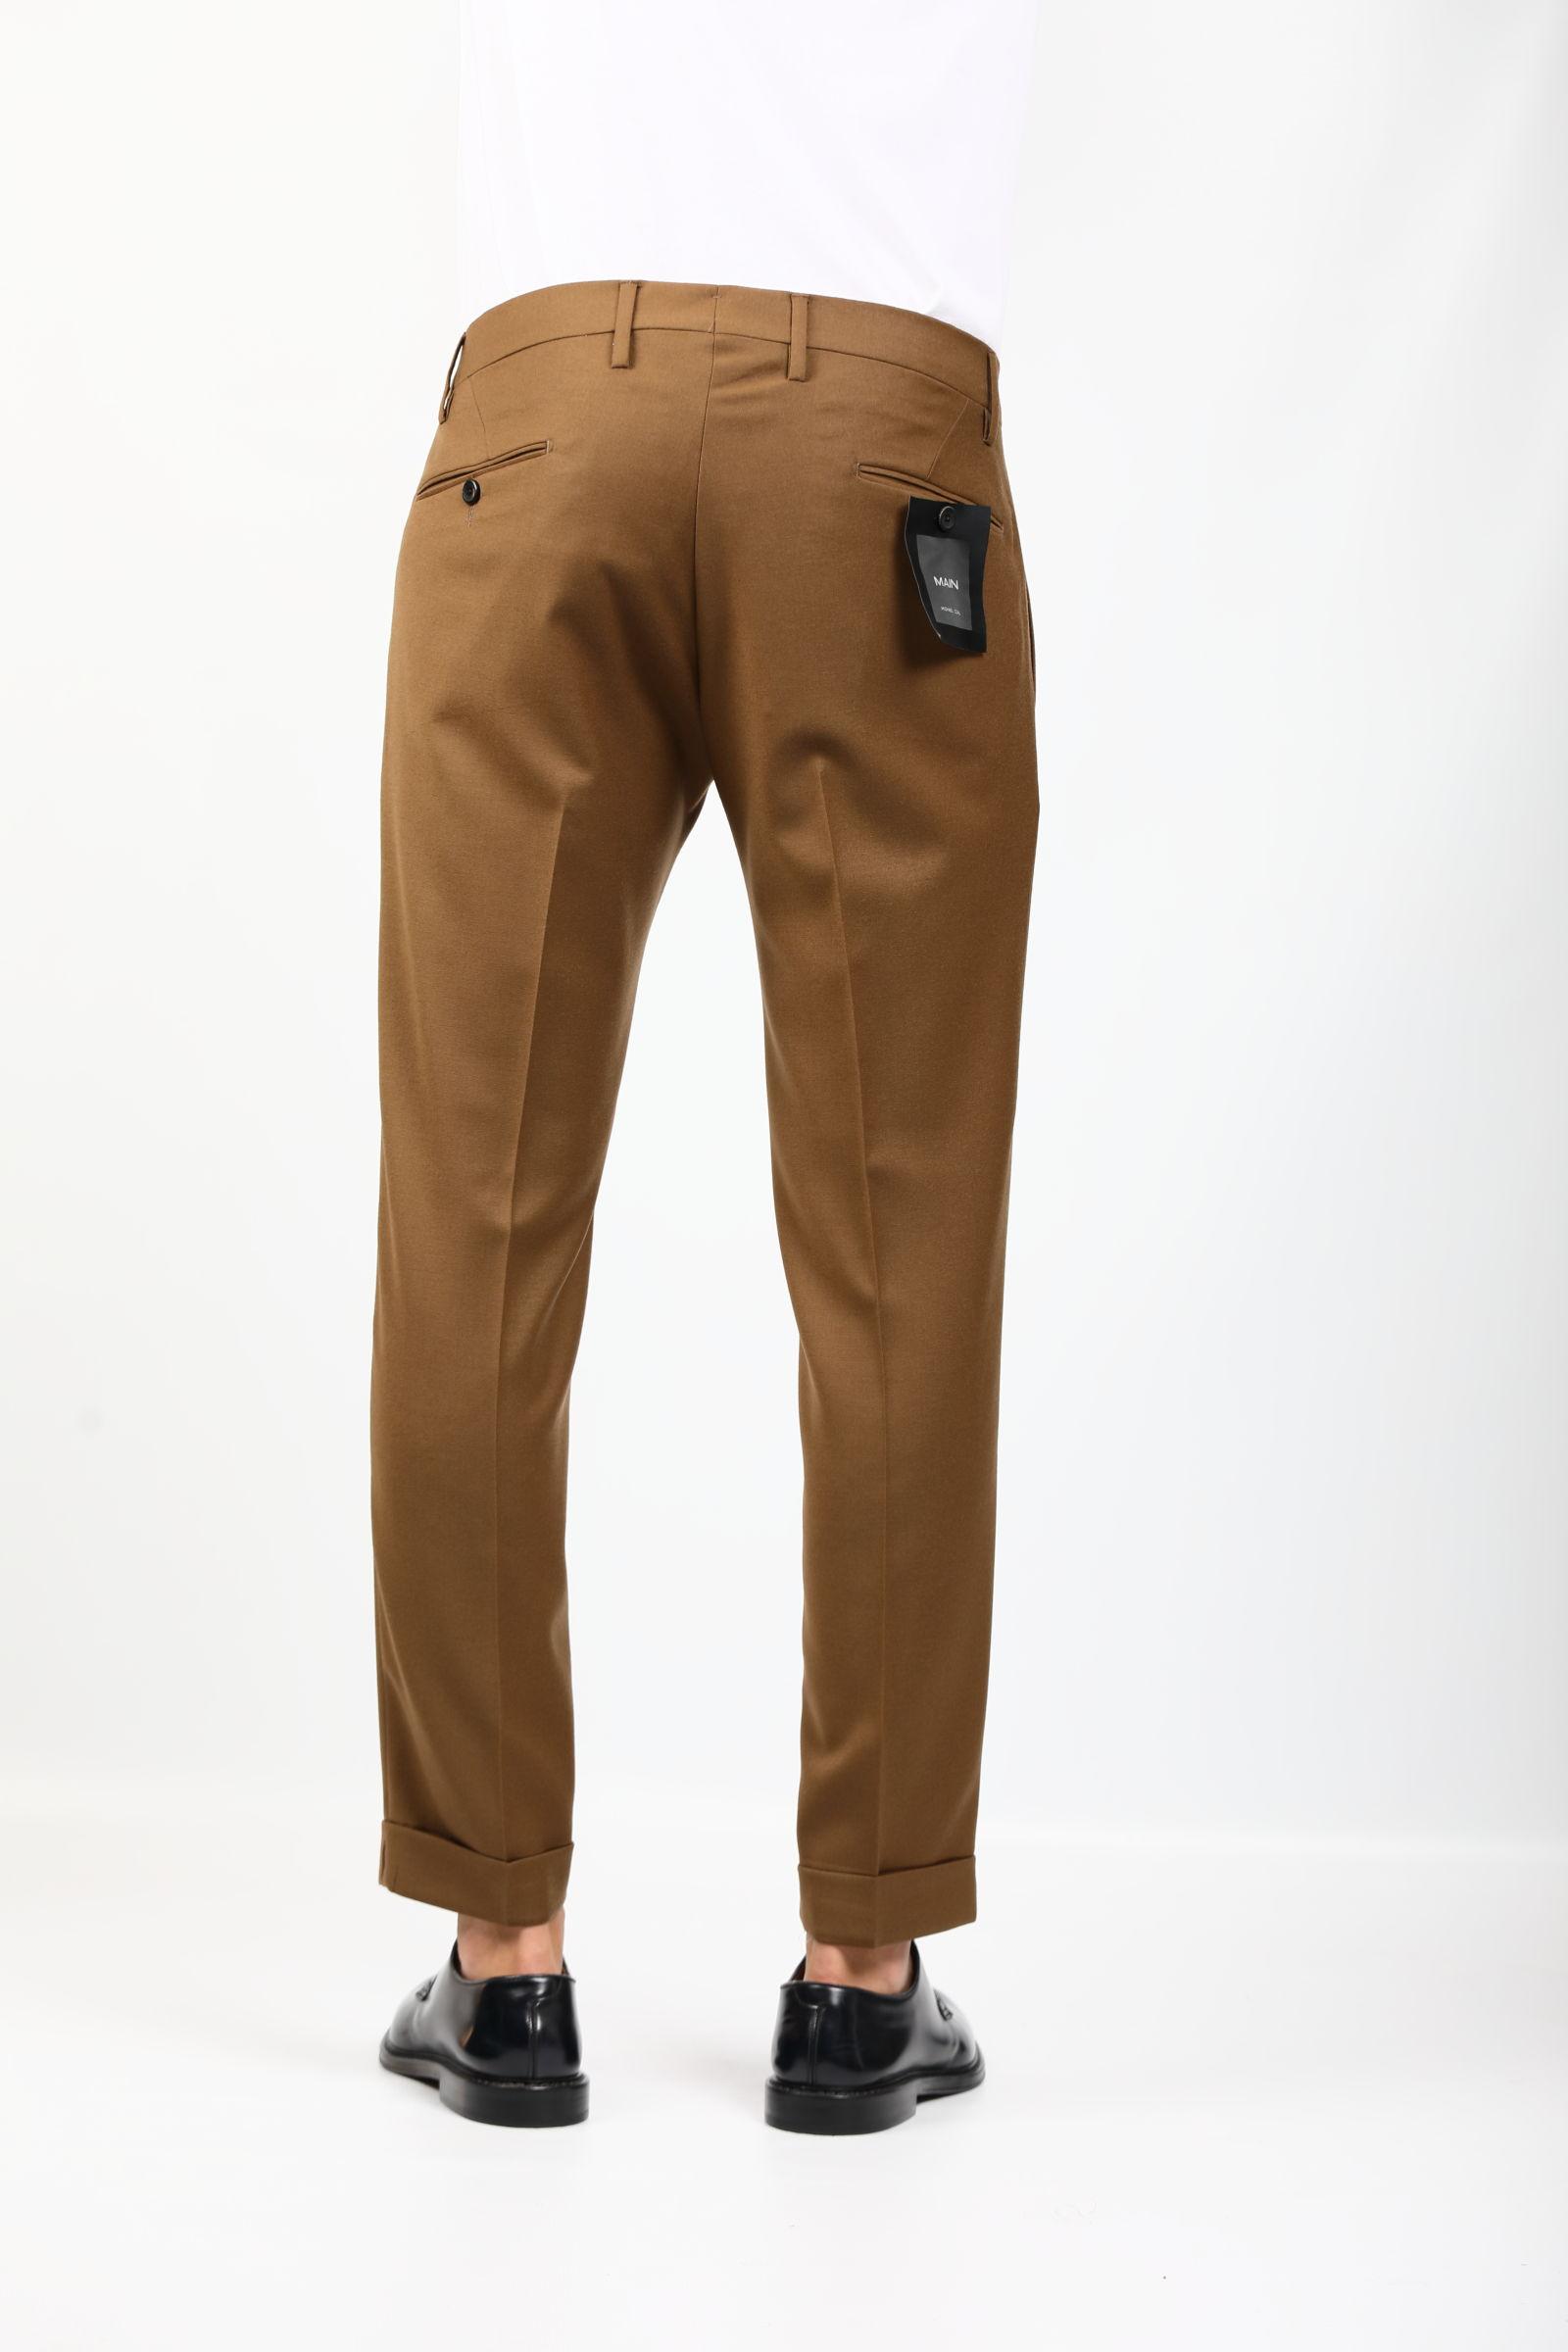 FREDERICK IN LANA ELASTICIZZATA MICHAEL COAL   Pantaloni   MCFR2.3713F21C169